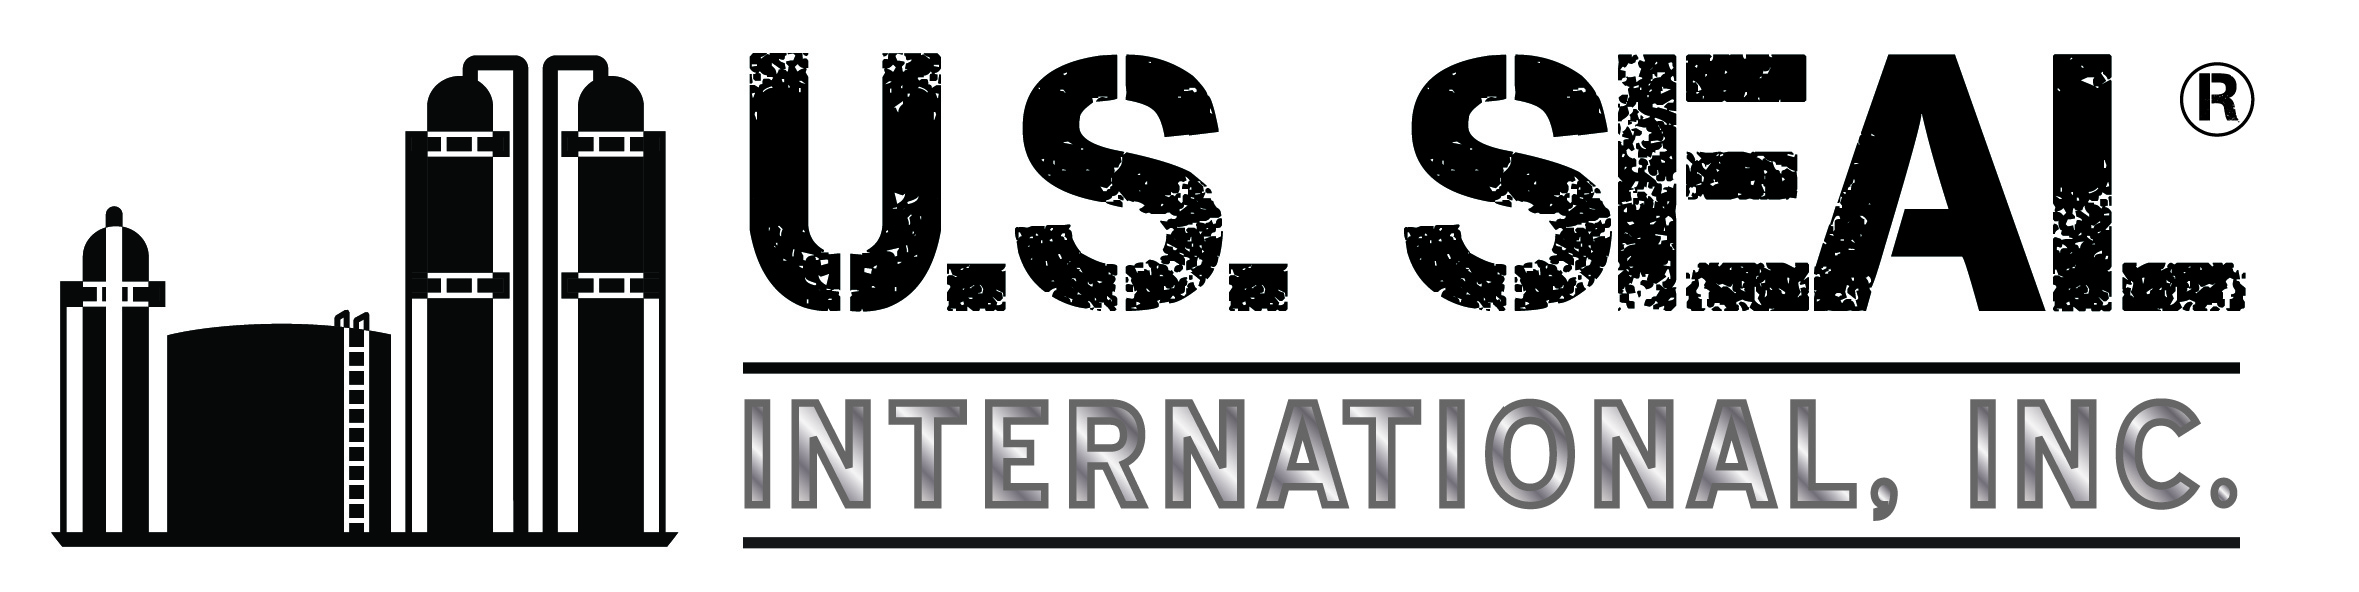 usi_logo_silver_OnWhiteRndRect